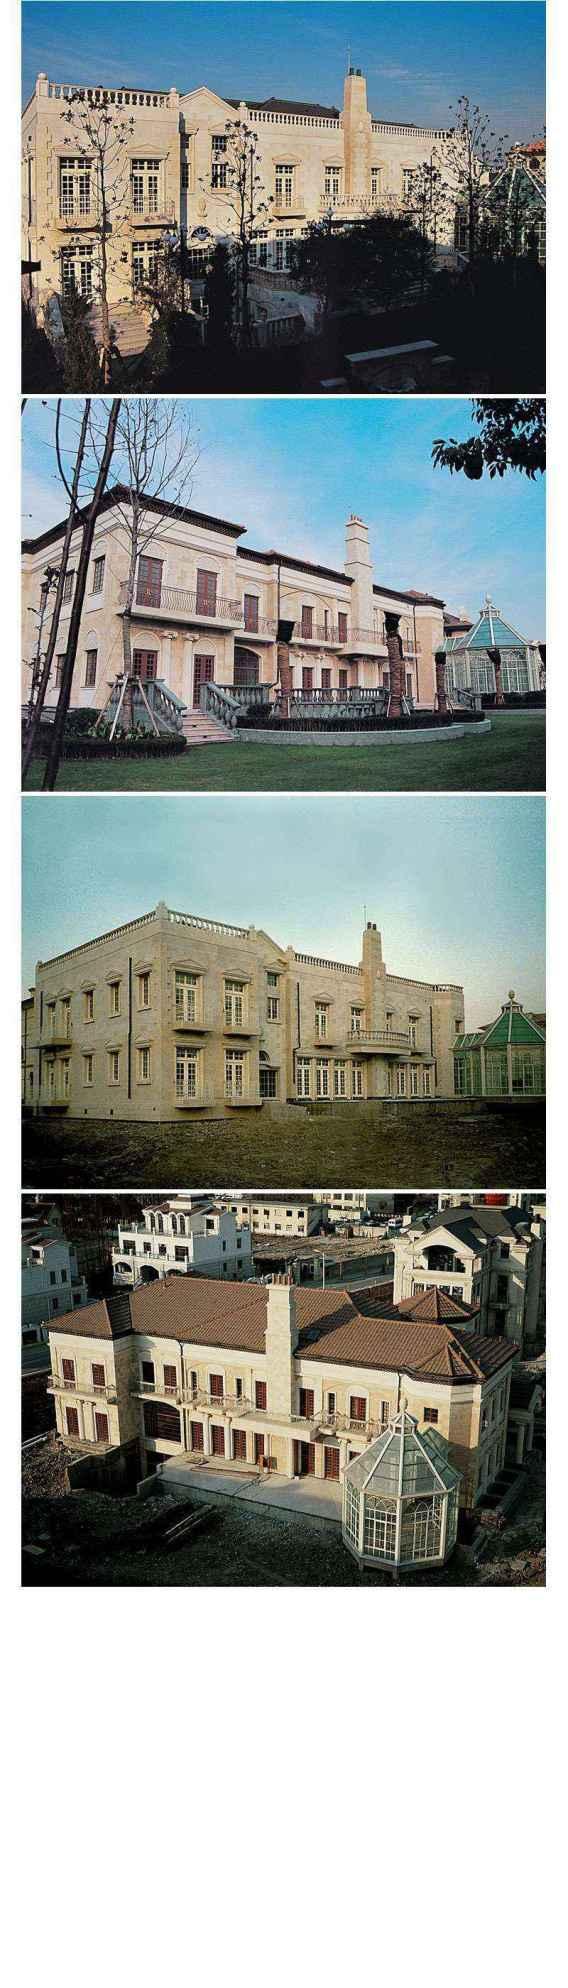 ★【Villa CAD Design,Details Project V.7-British George Style】Chateau,Manor,Mansion,Villa@Autocad Blocks,Drawings,CAD Details,Elevation